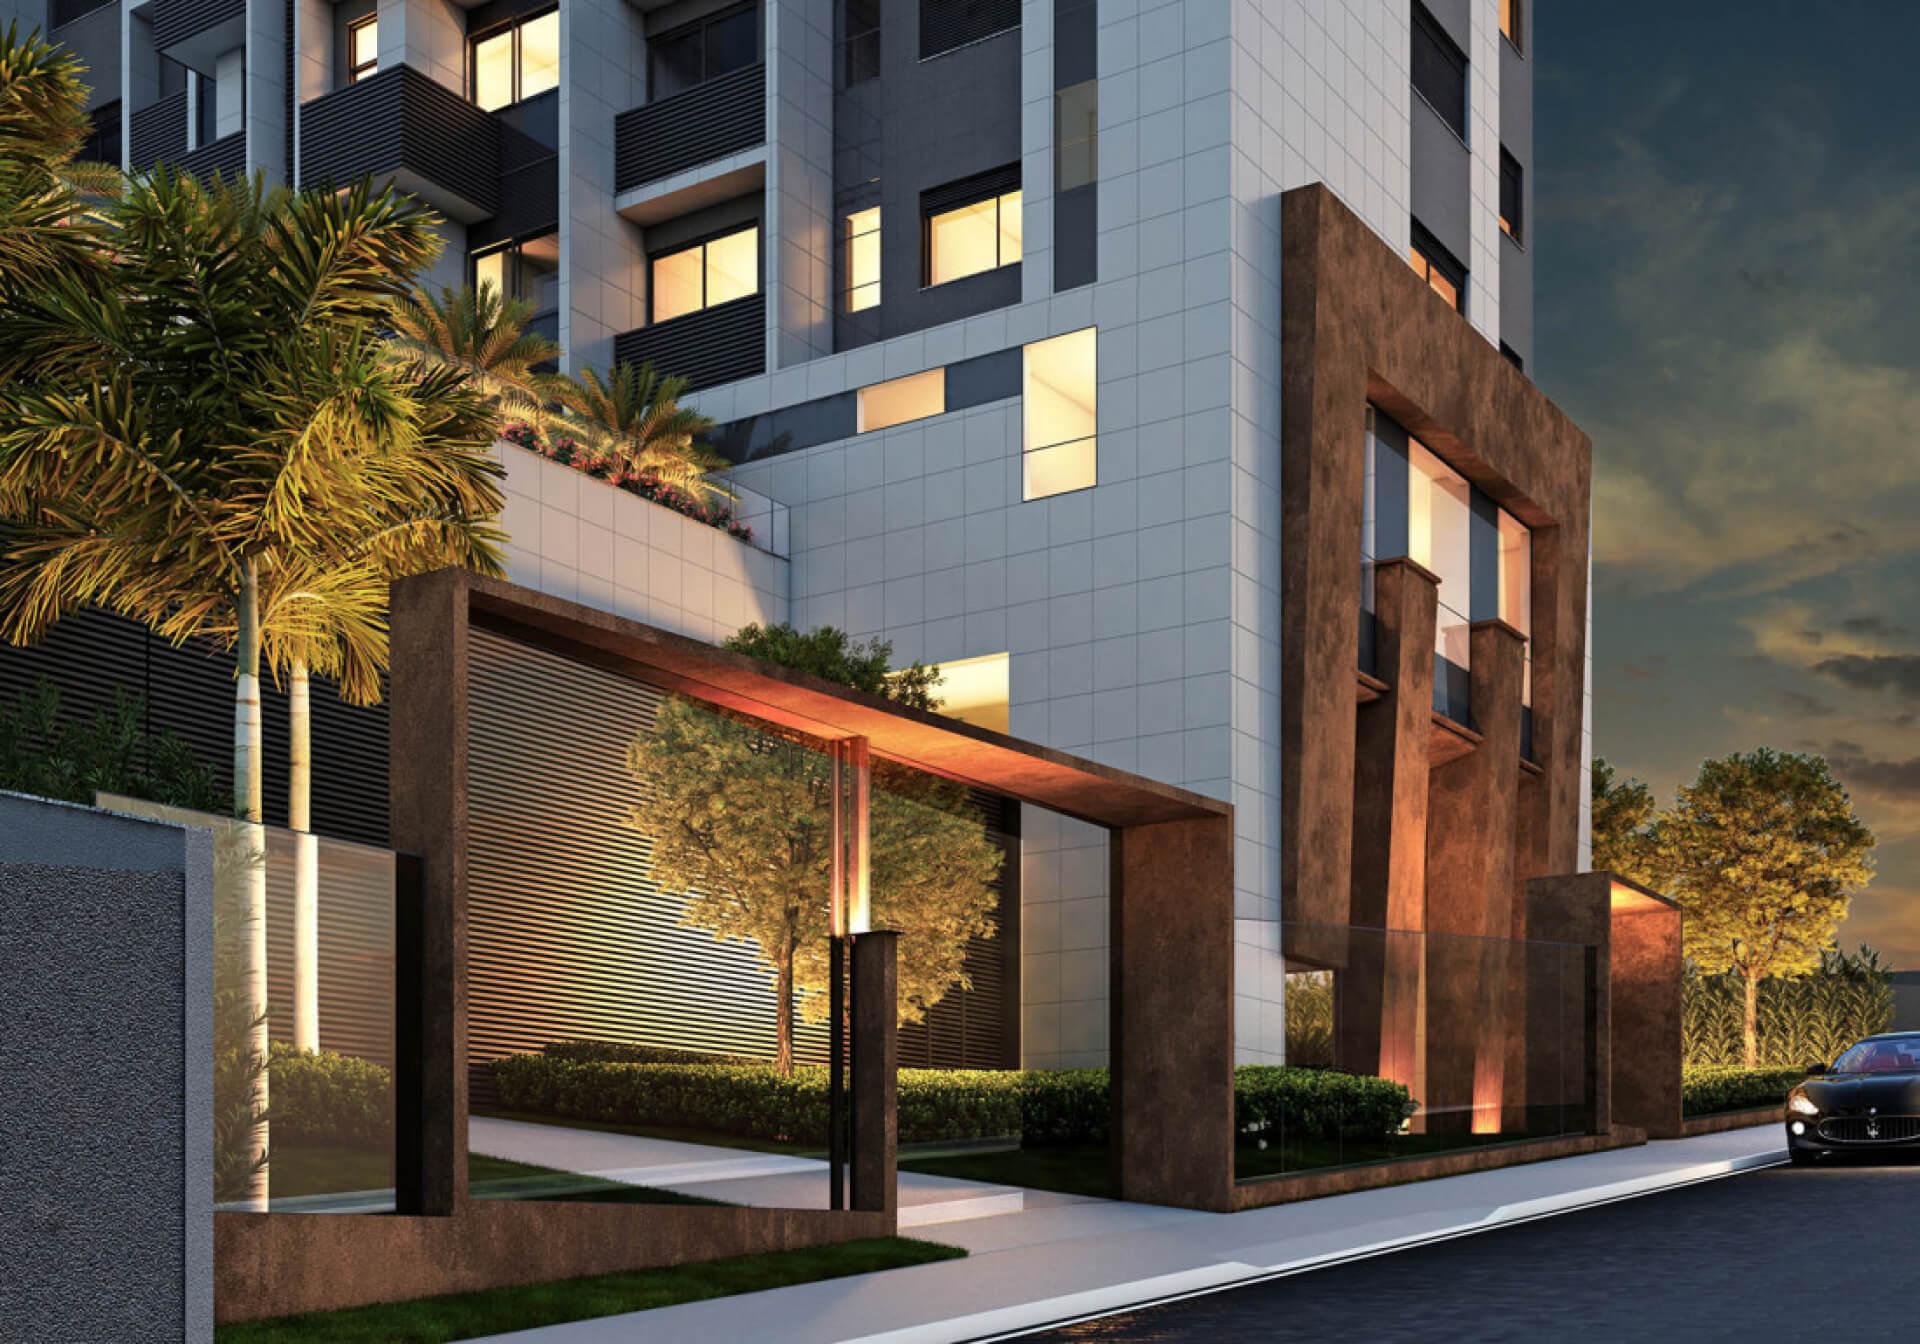 Edifício Lumens, foto 2